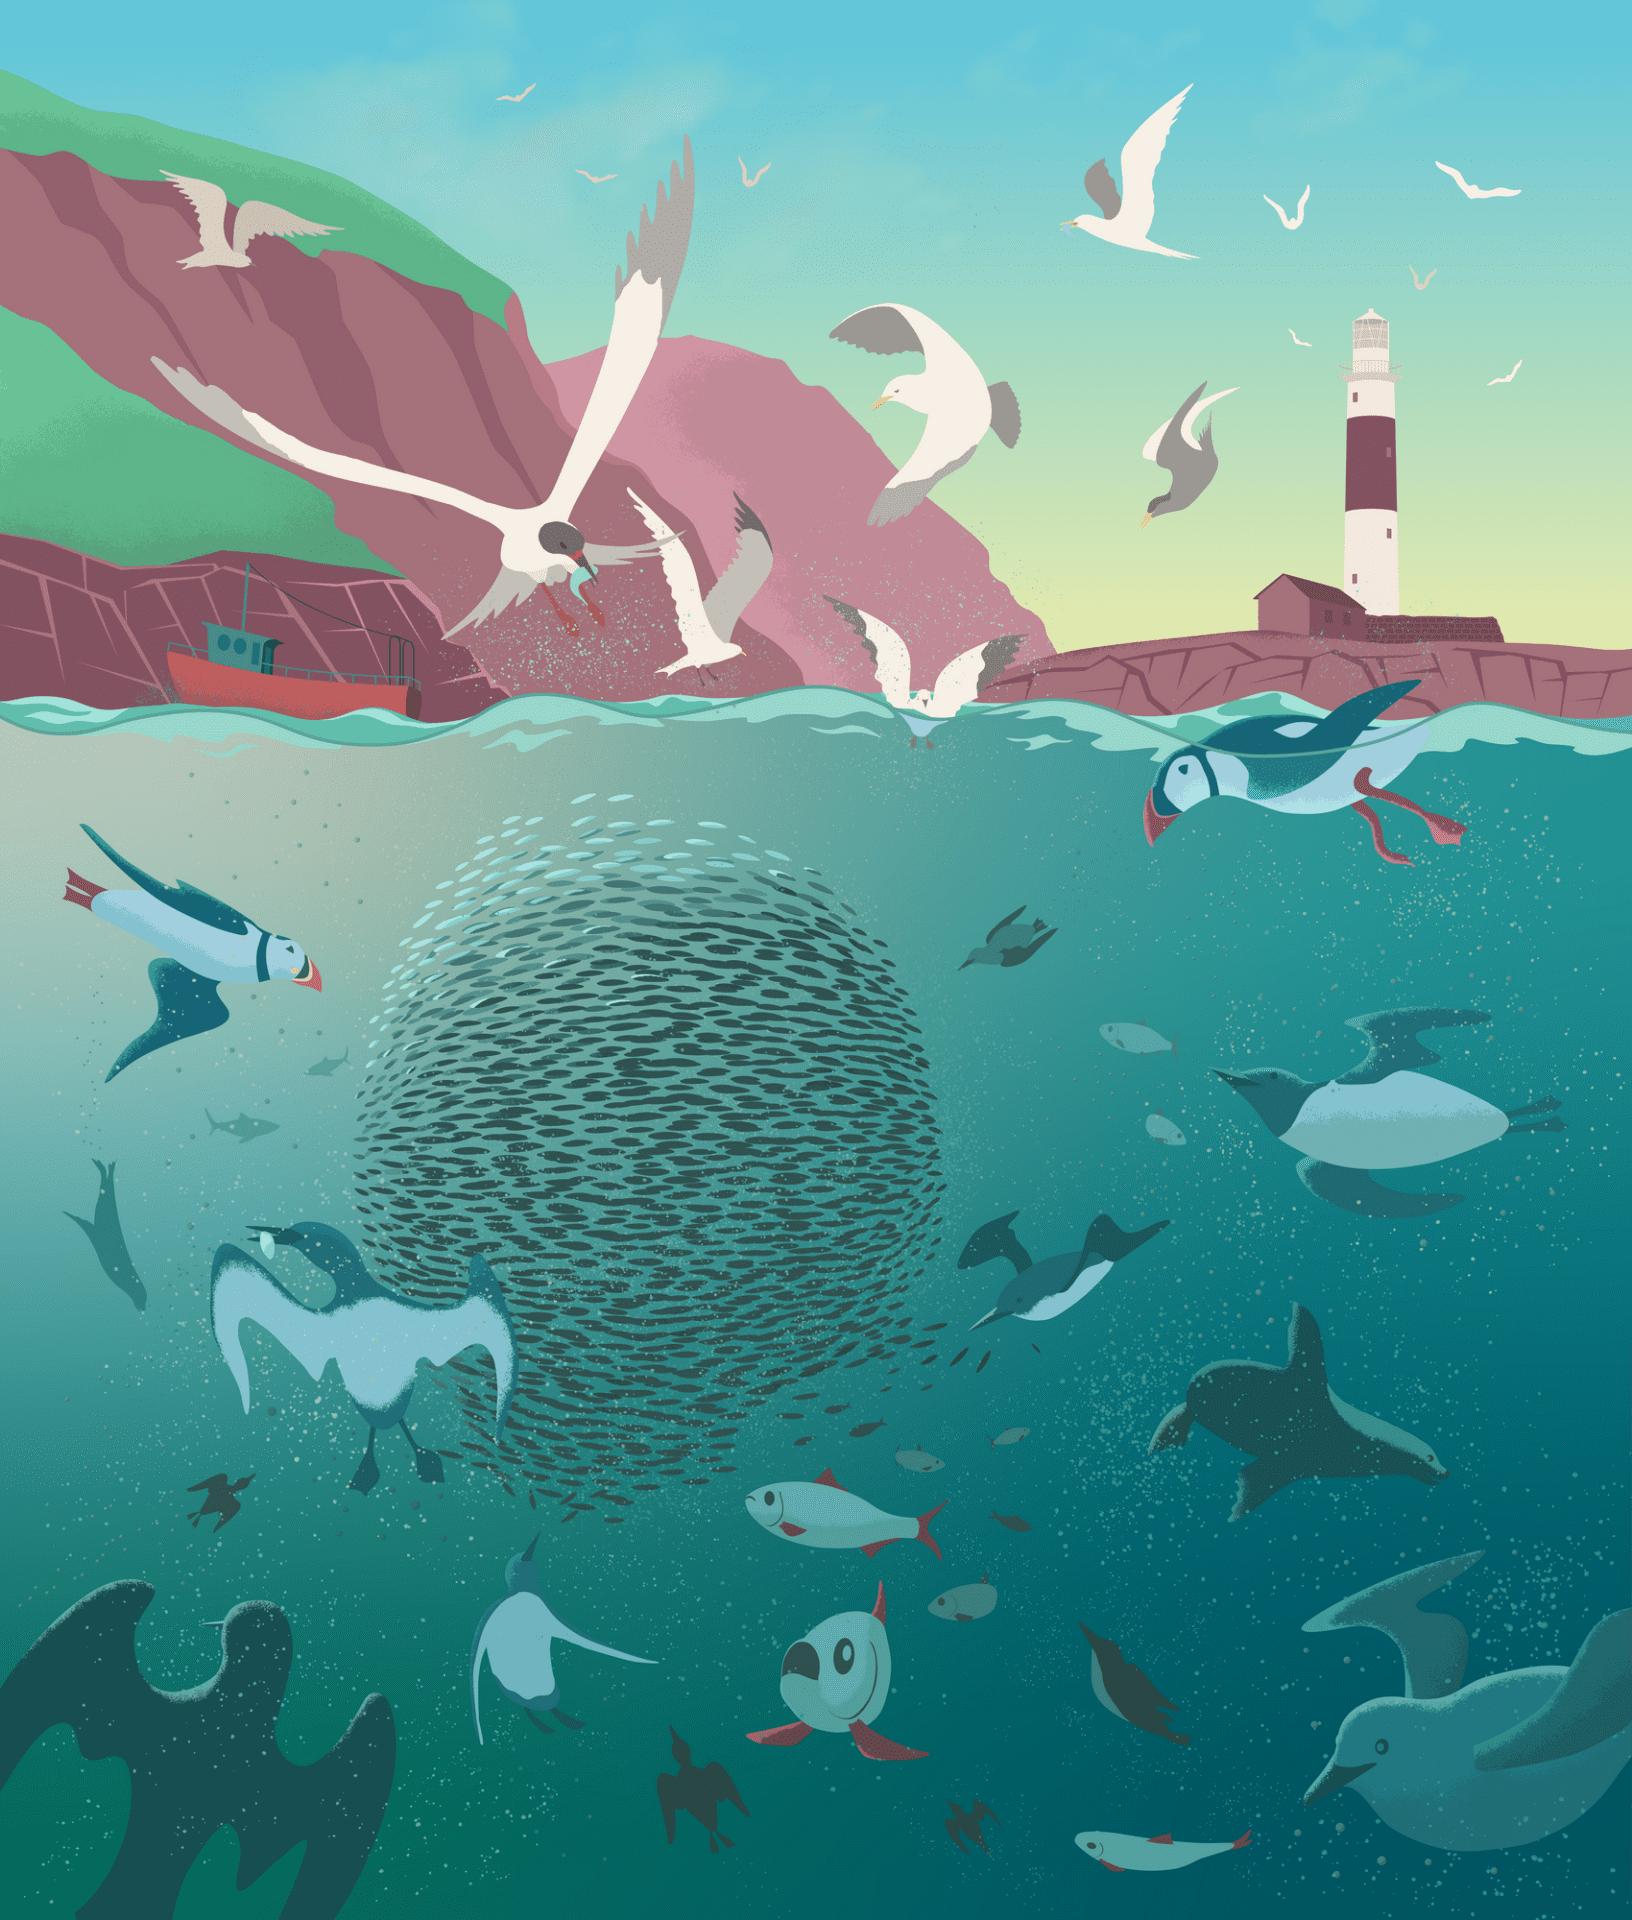 Fish-Herring and sea life off Rockabill-Jacek Matysiak